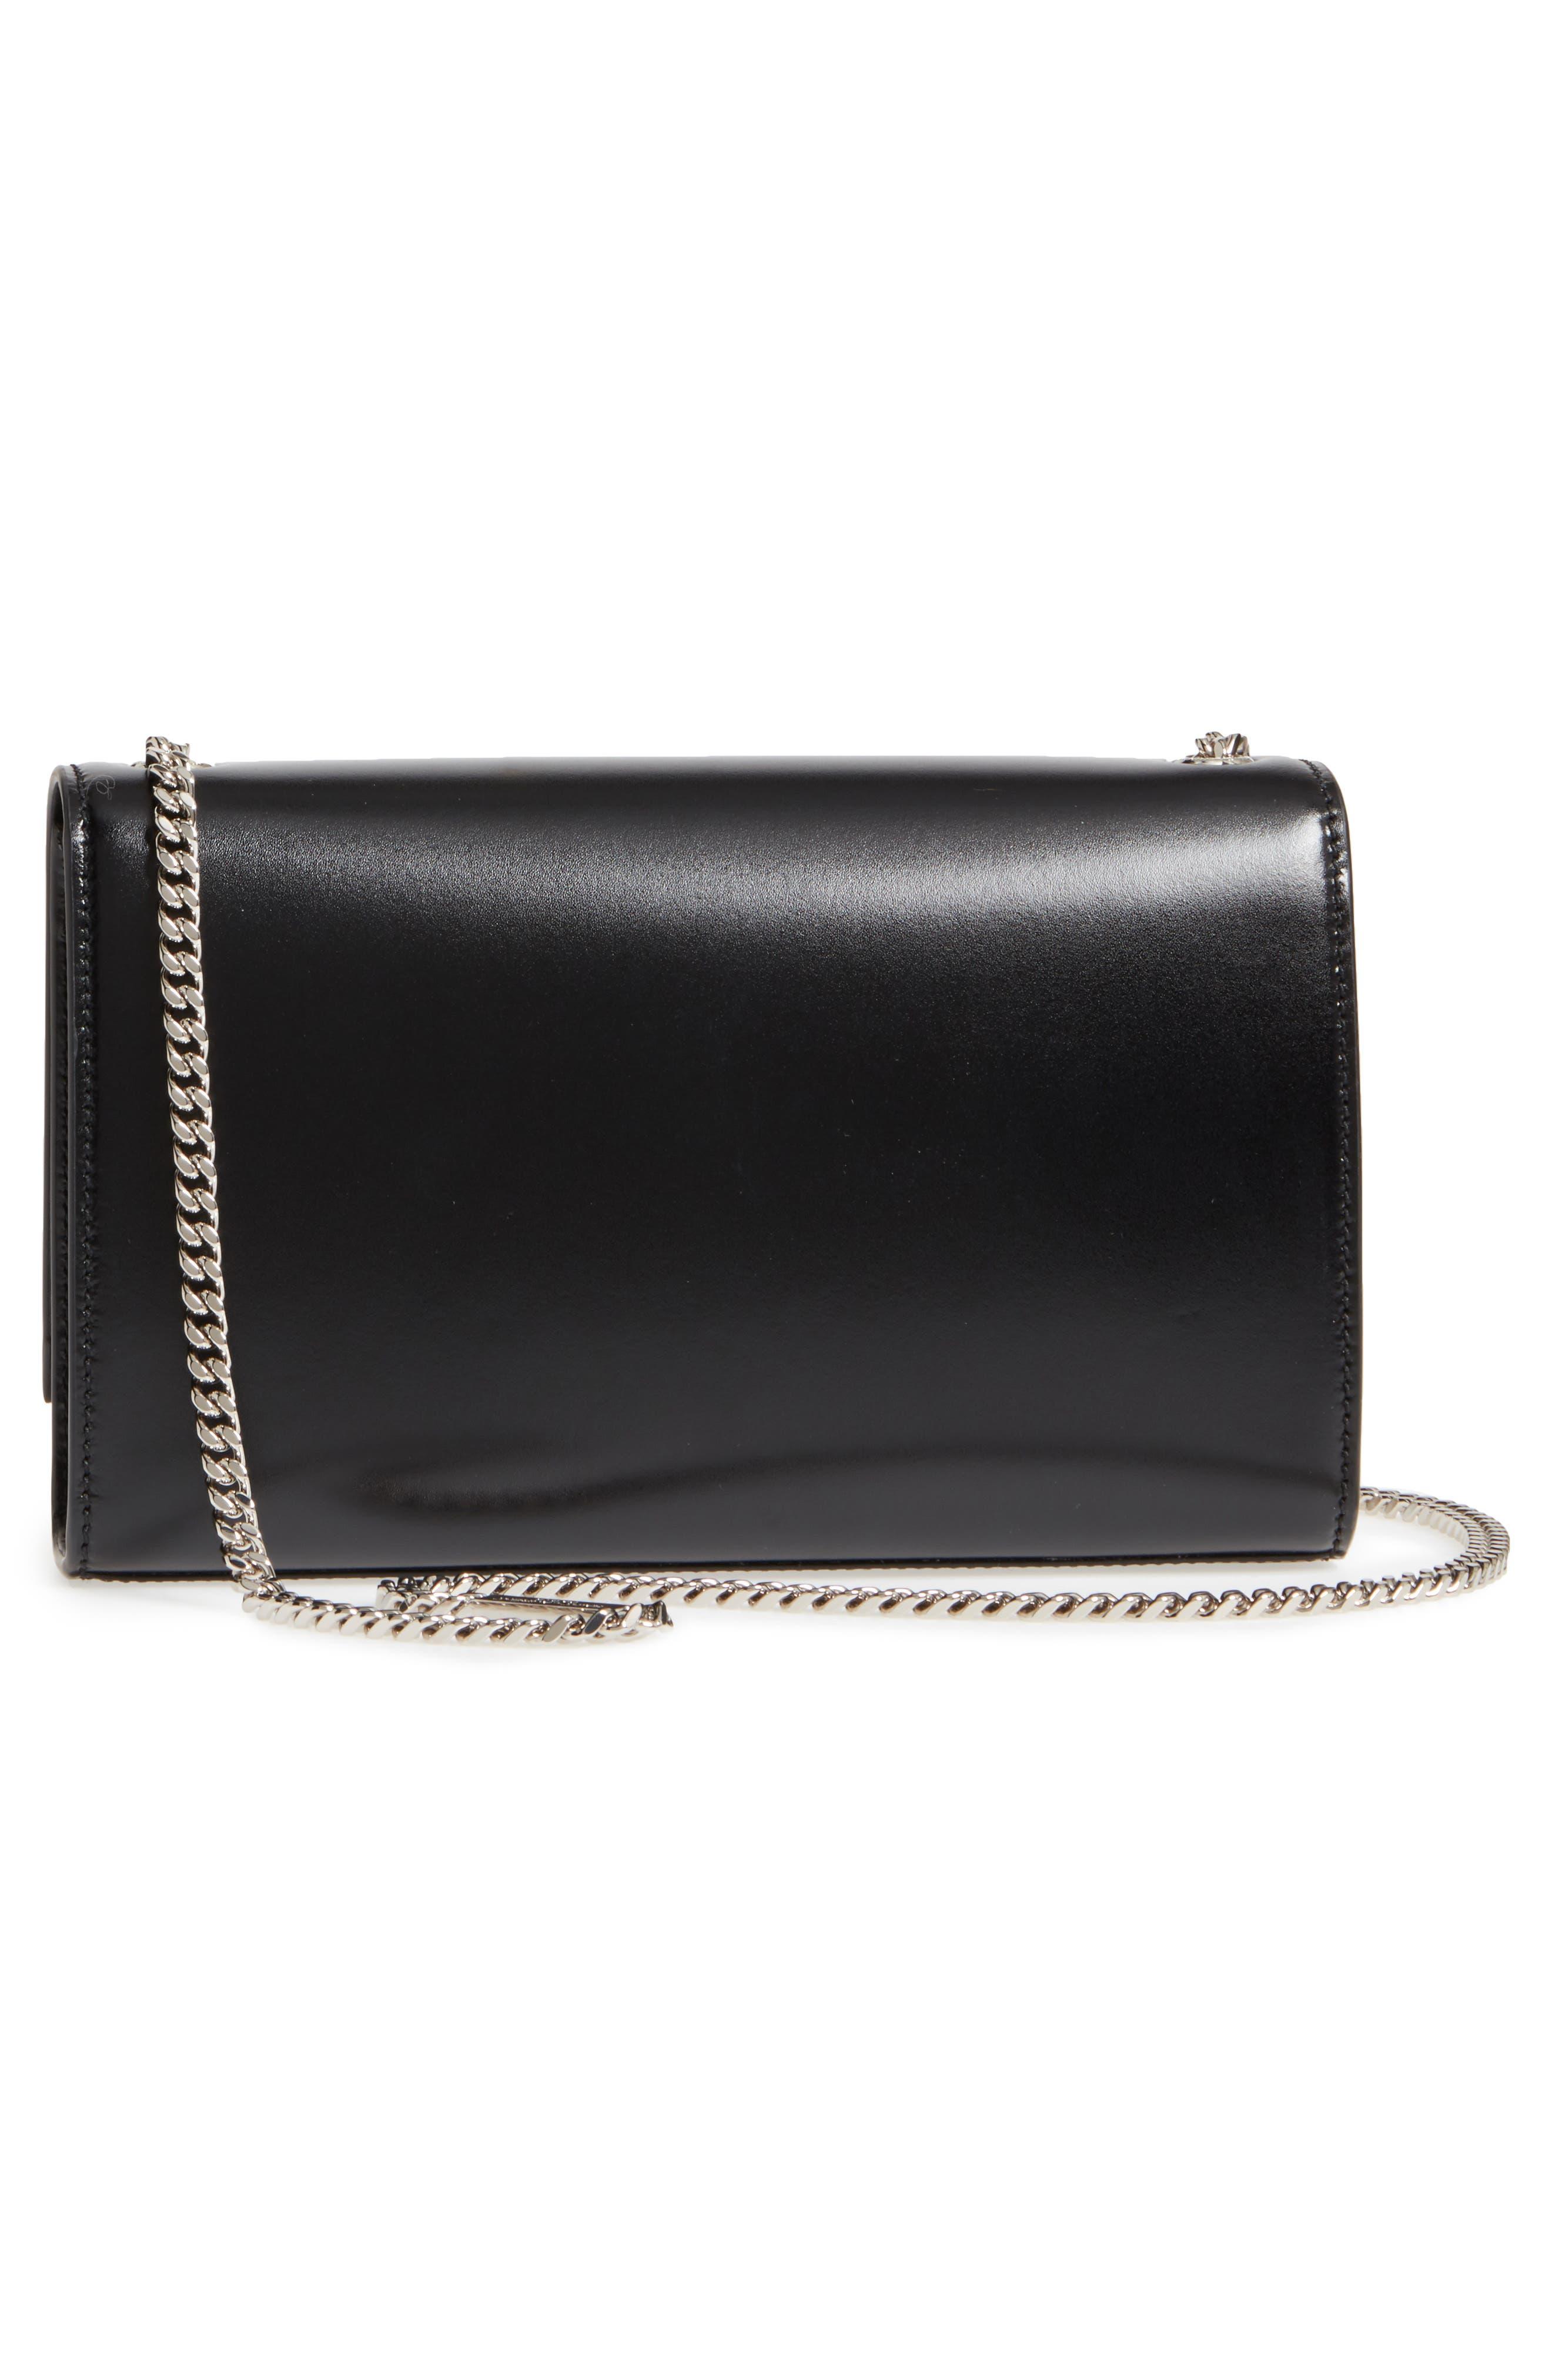 Medium Kate Calfskin Leather Crossbody Bag,                             Alternate thumbnail 3, color,                             Noir